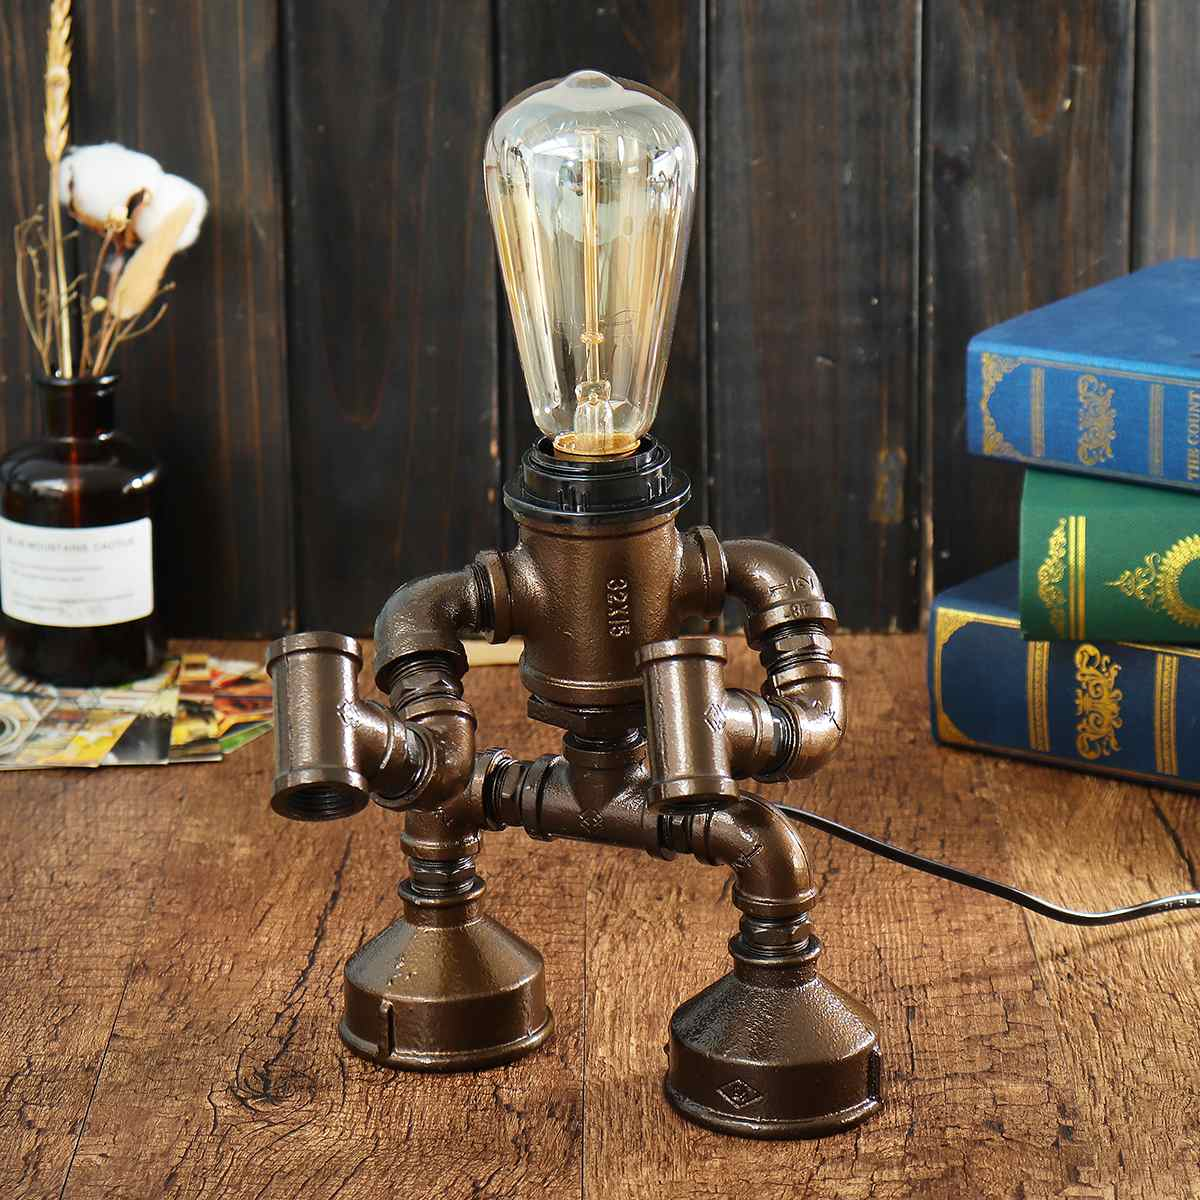 Us 38 26 34 Off Metal Industrial Robot Light E27 Water Pipe Steampunk Table Lamp Fixture Home Decoration Indoor Lighting Bedroom Desk Lantern In